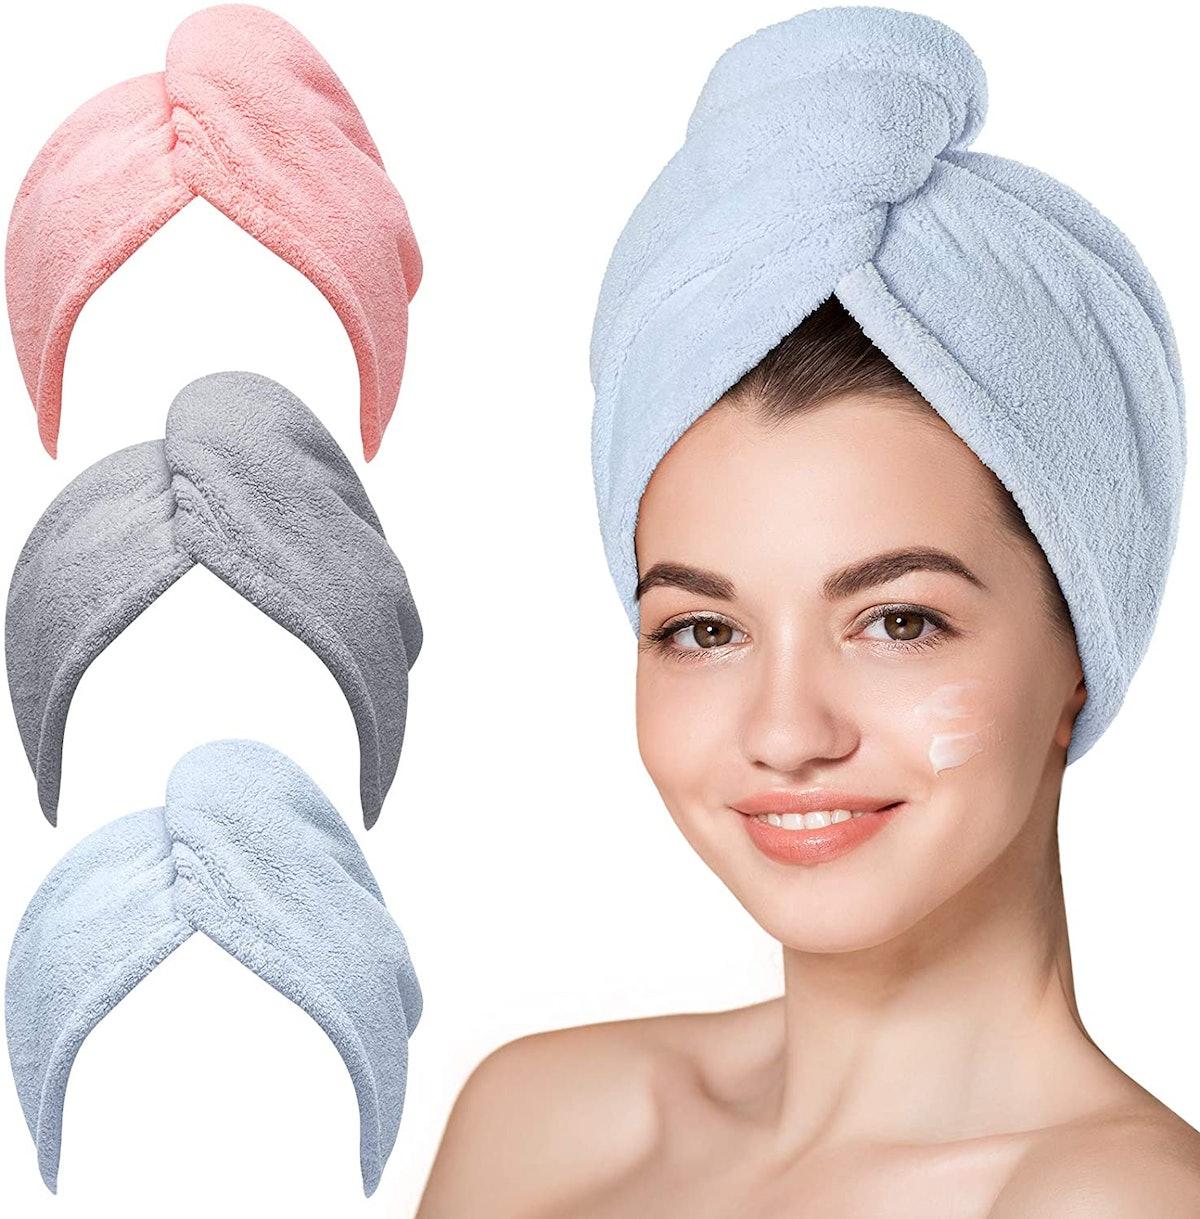 Microfiber Hair Towel,Hicober (3 Pack)